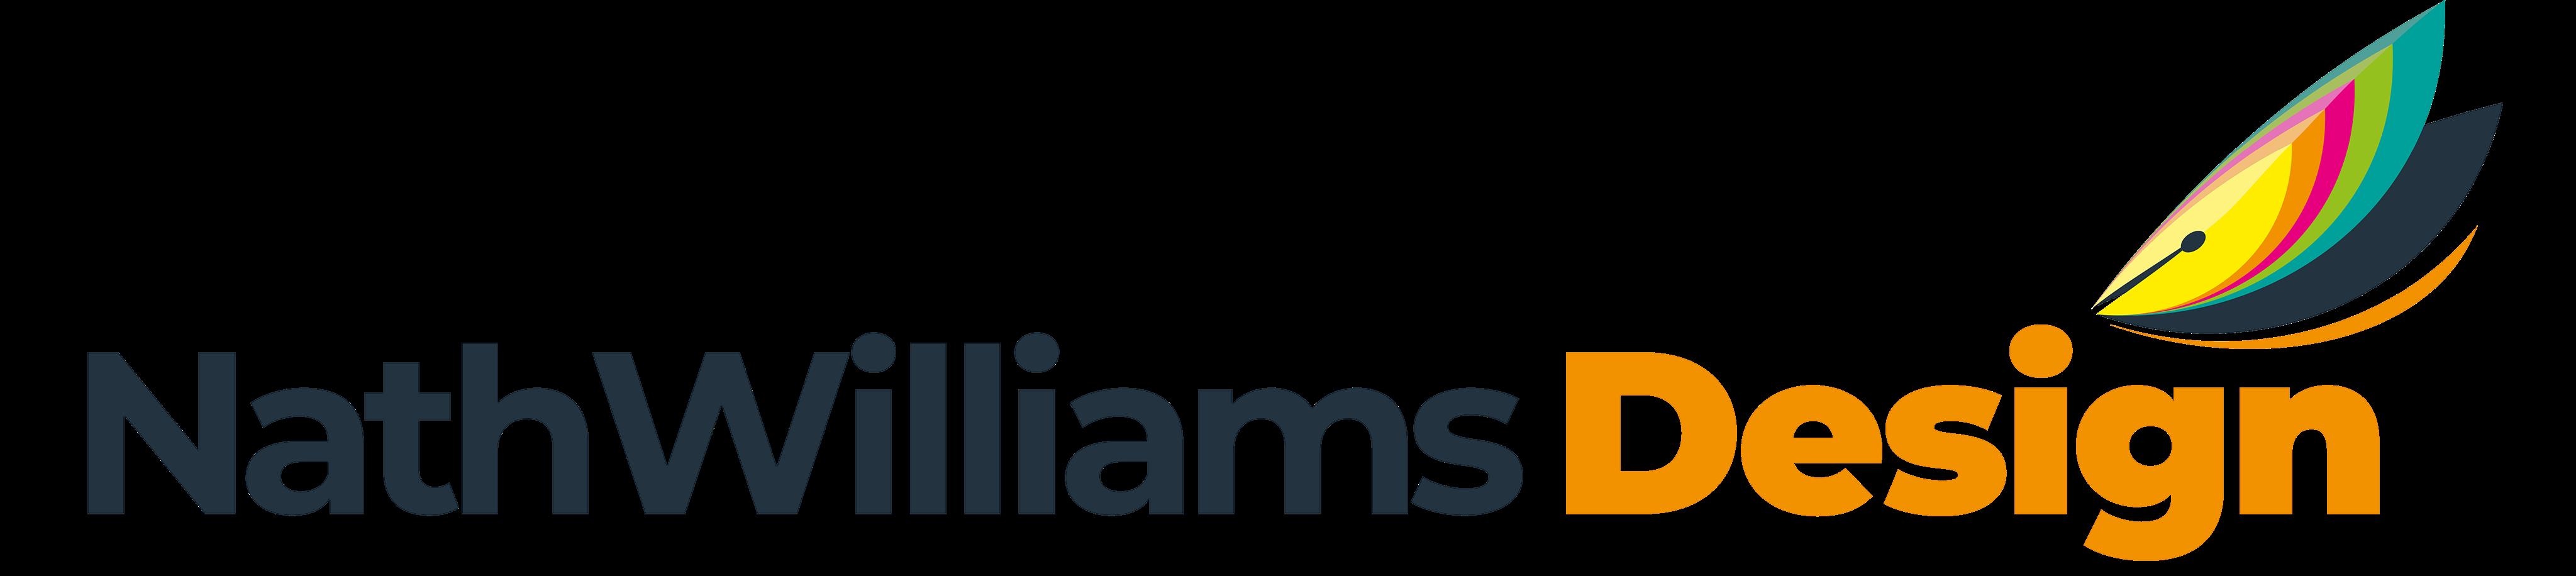 Nathan Williams Design